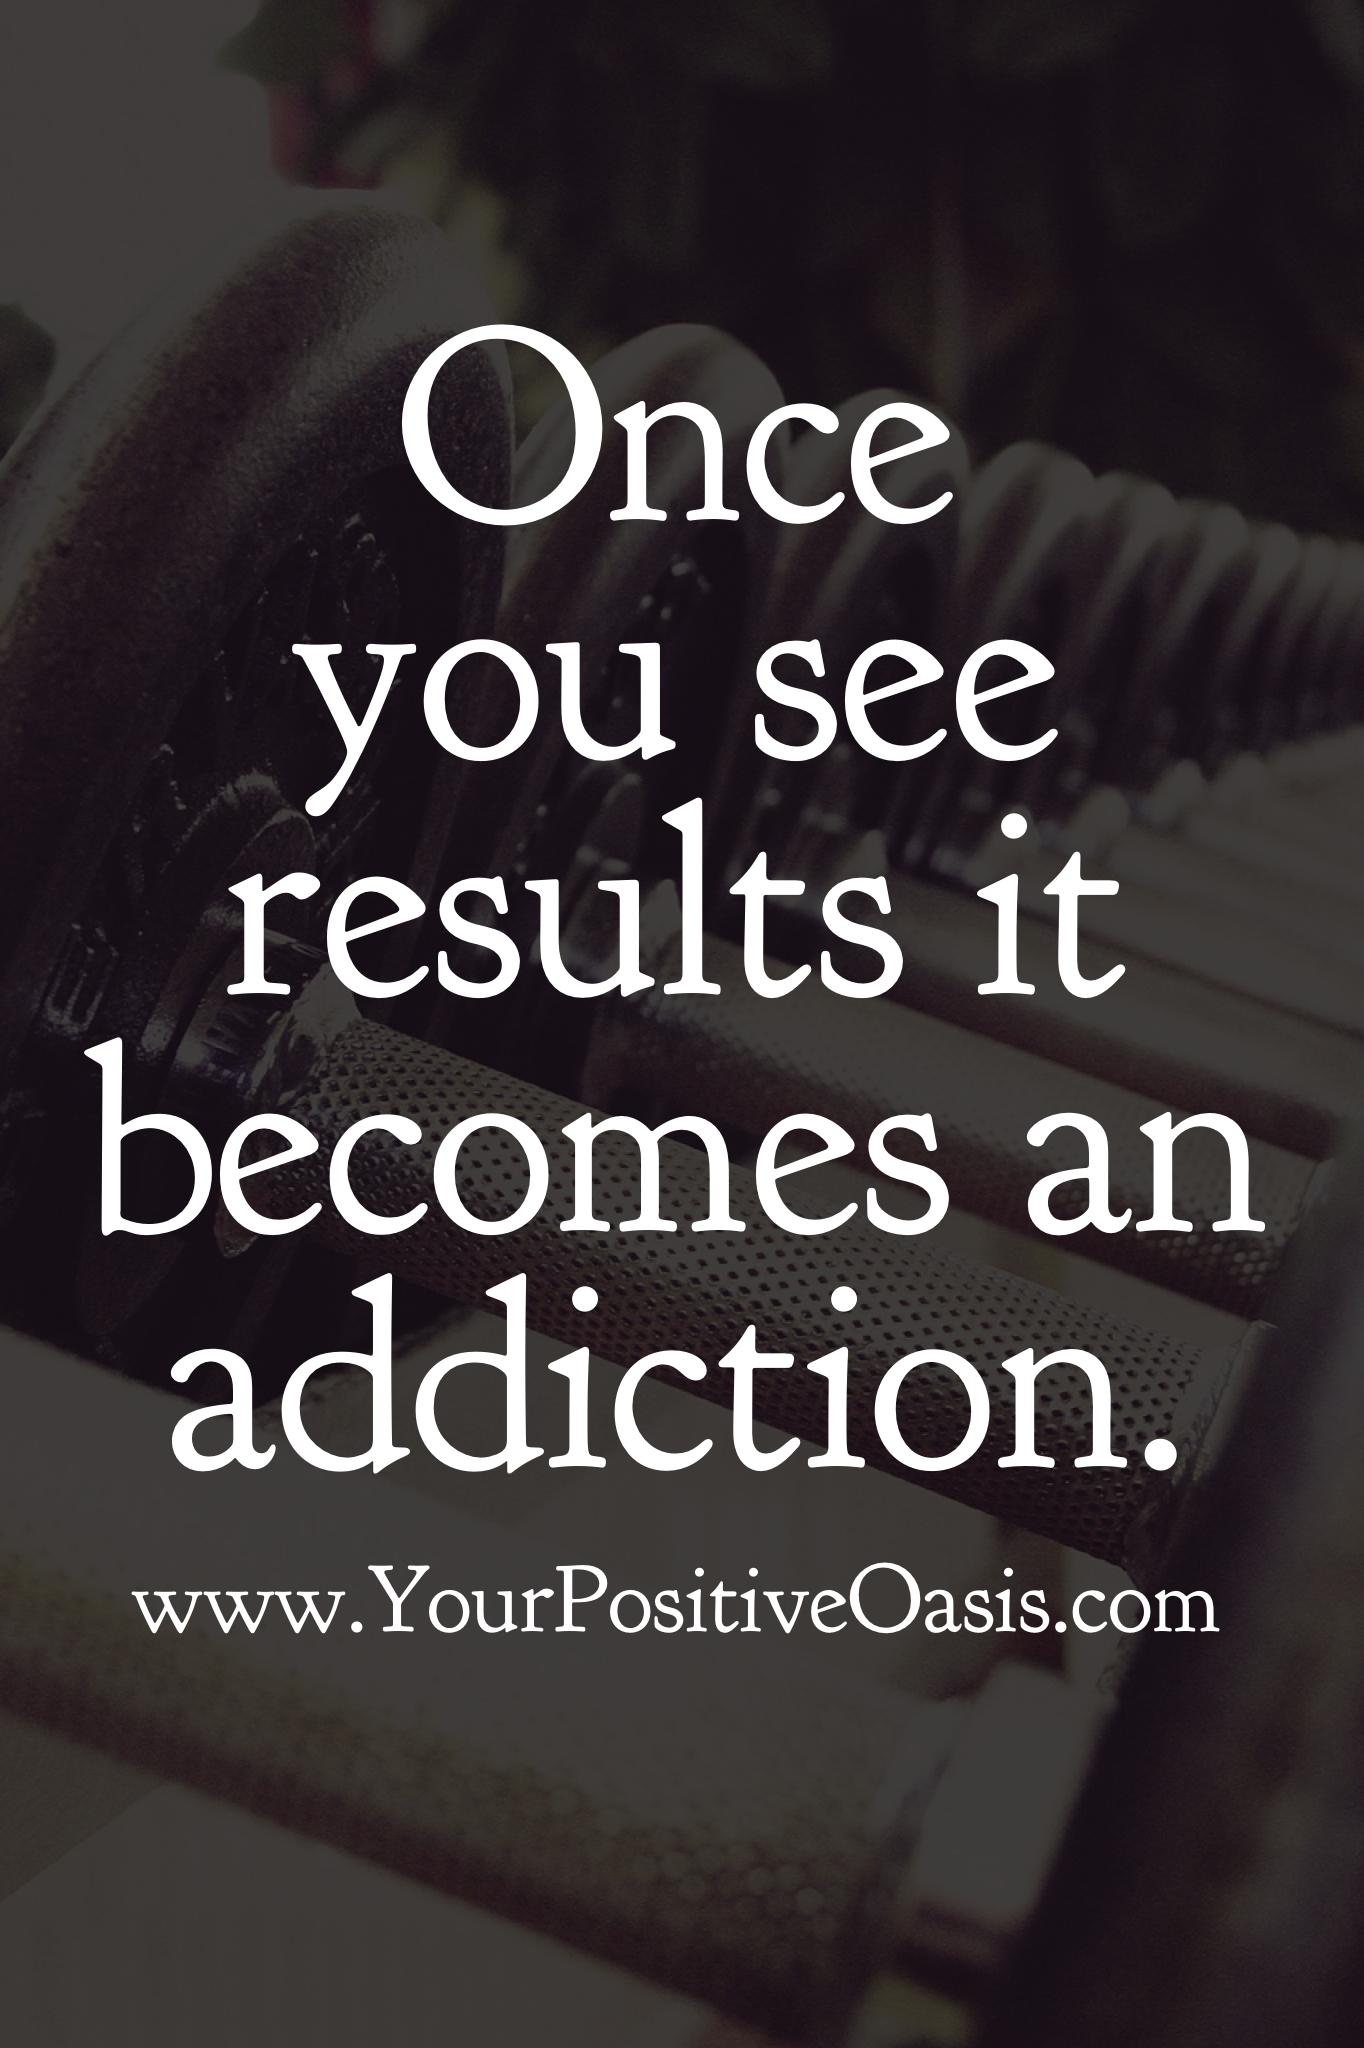 Fitness Motivation Fitness Goals Motivation Fitness Goals Quotes Motivation Goals